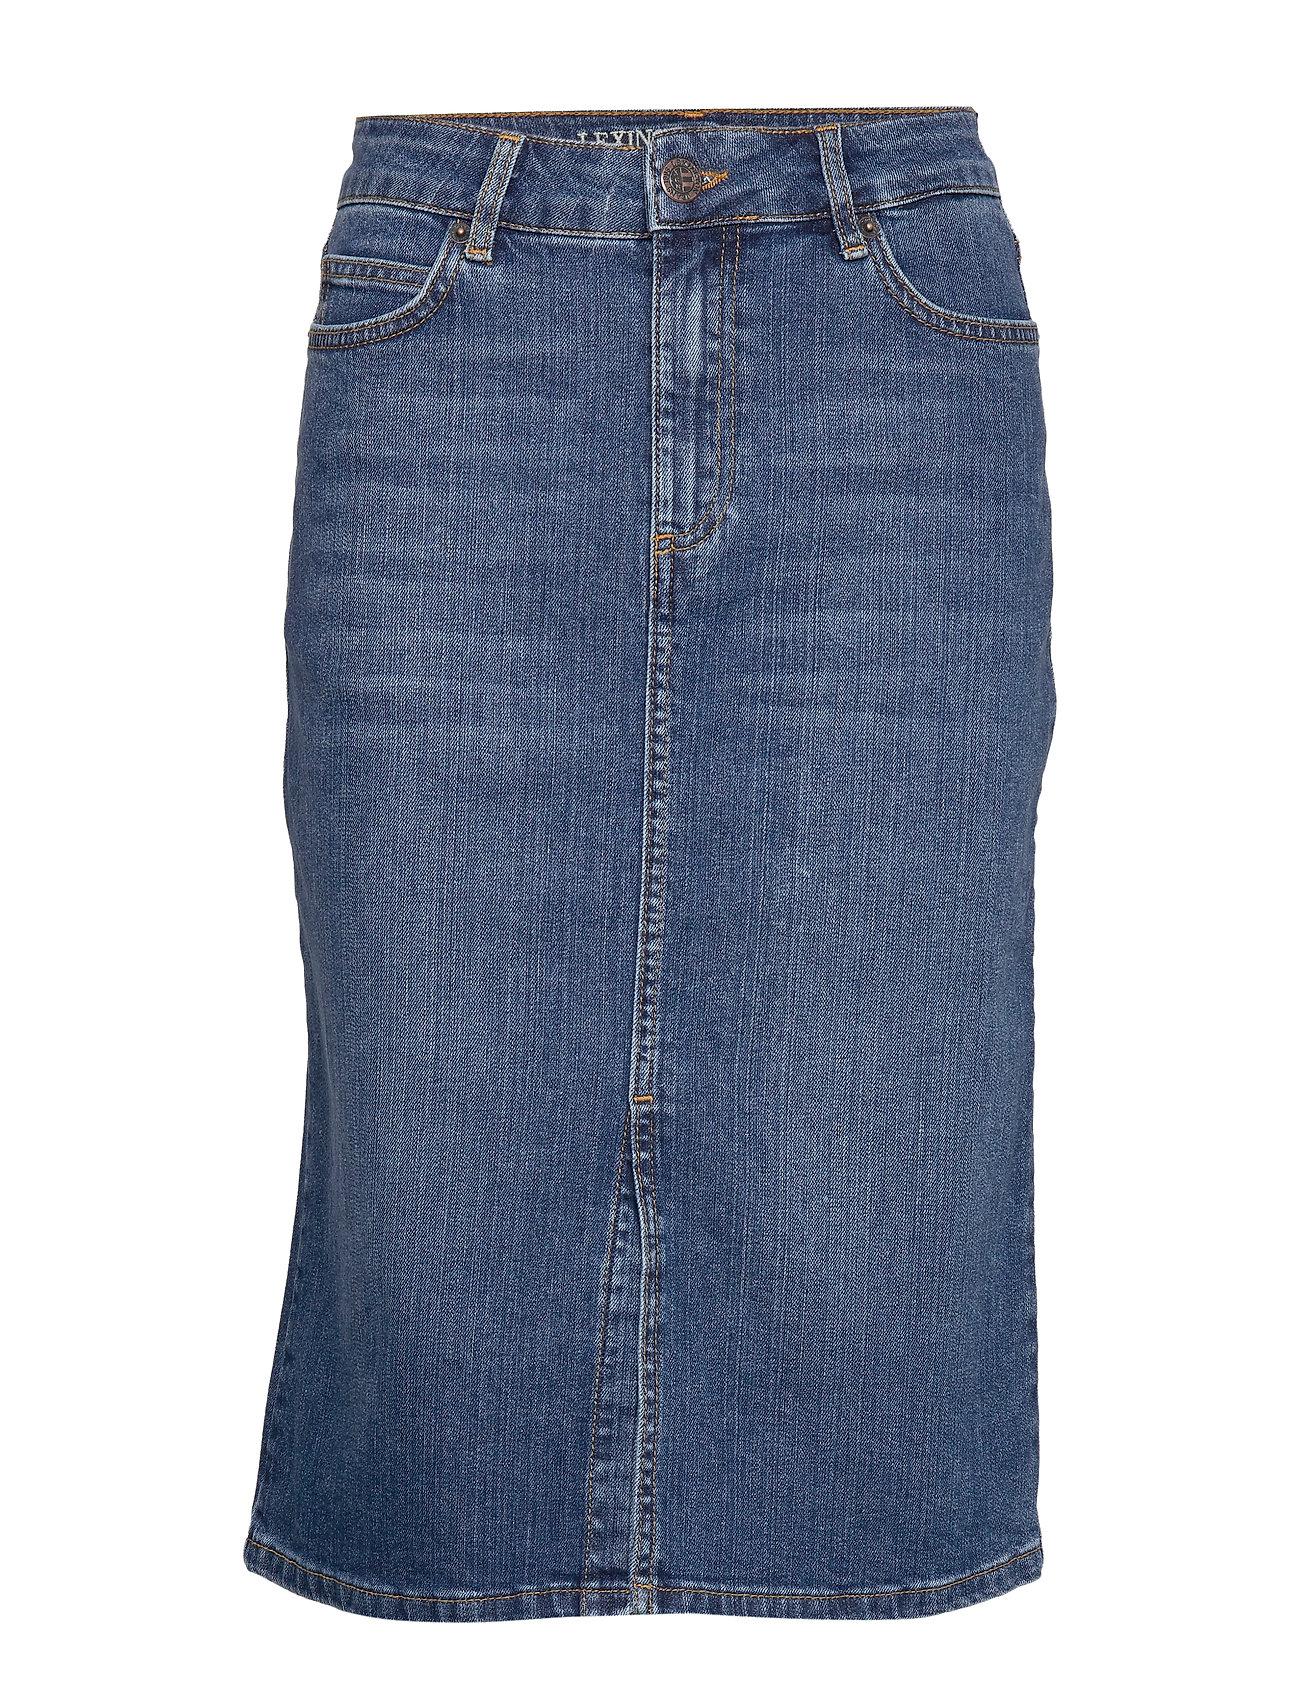 Lexington Clothing Millie Denim Skirt - MEDIUM BLUE DENIM